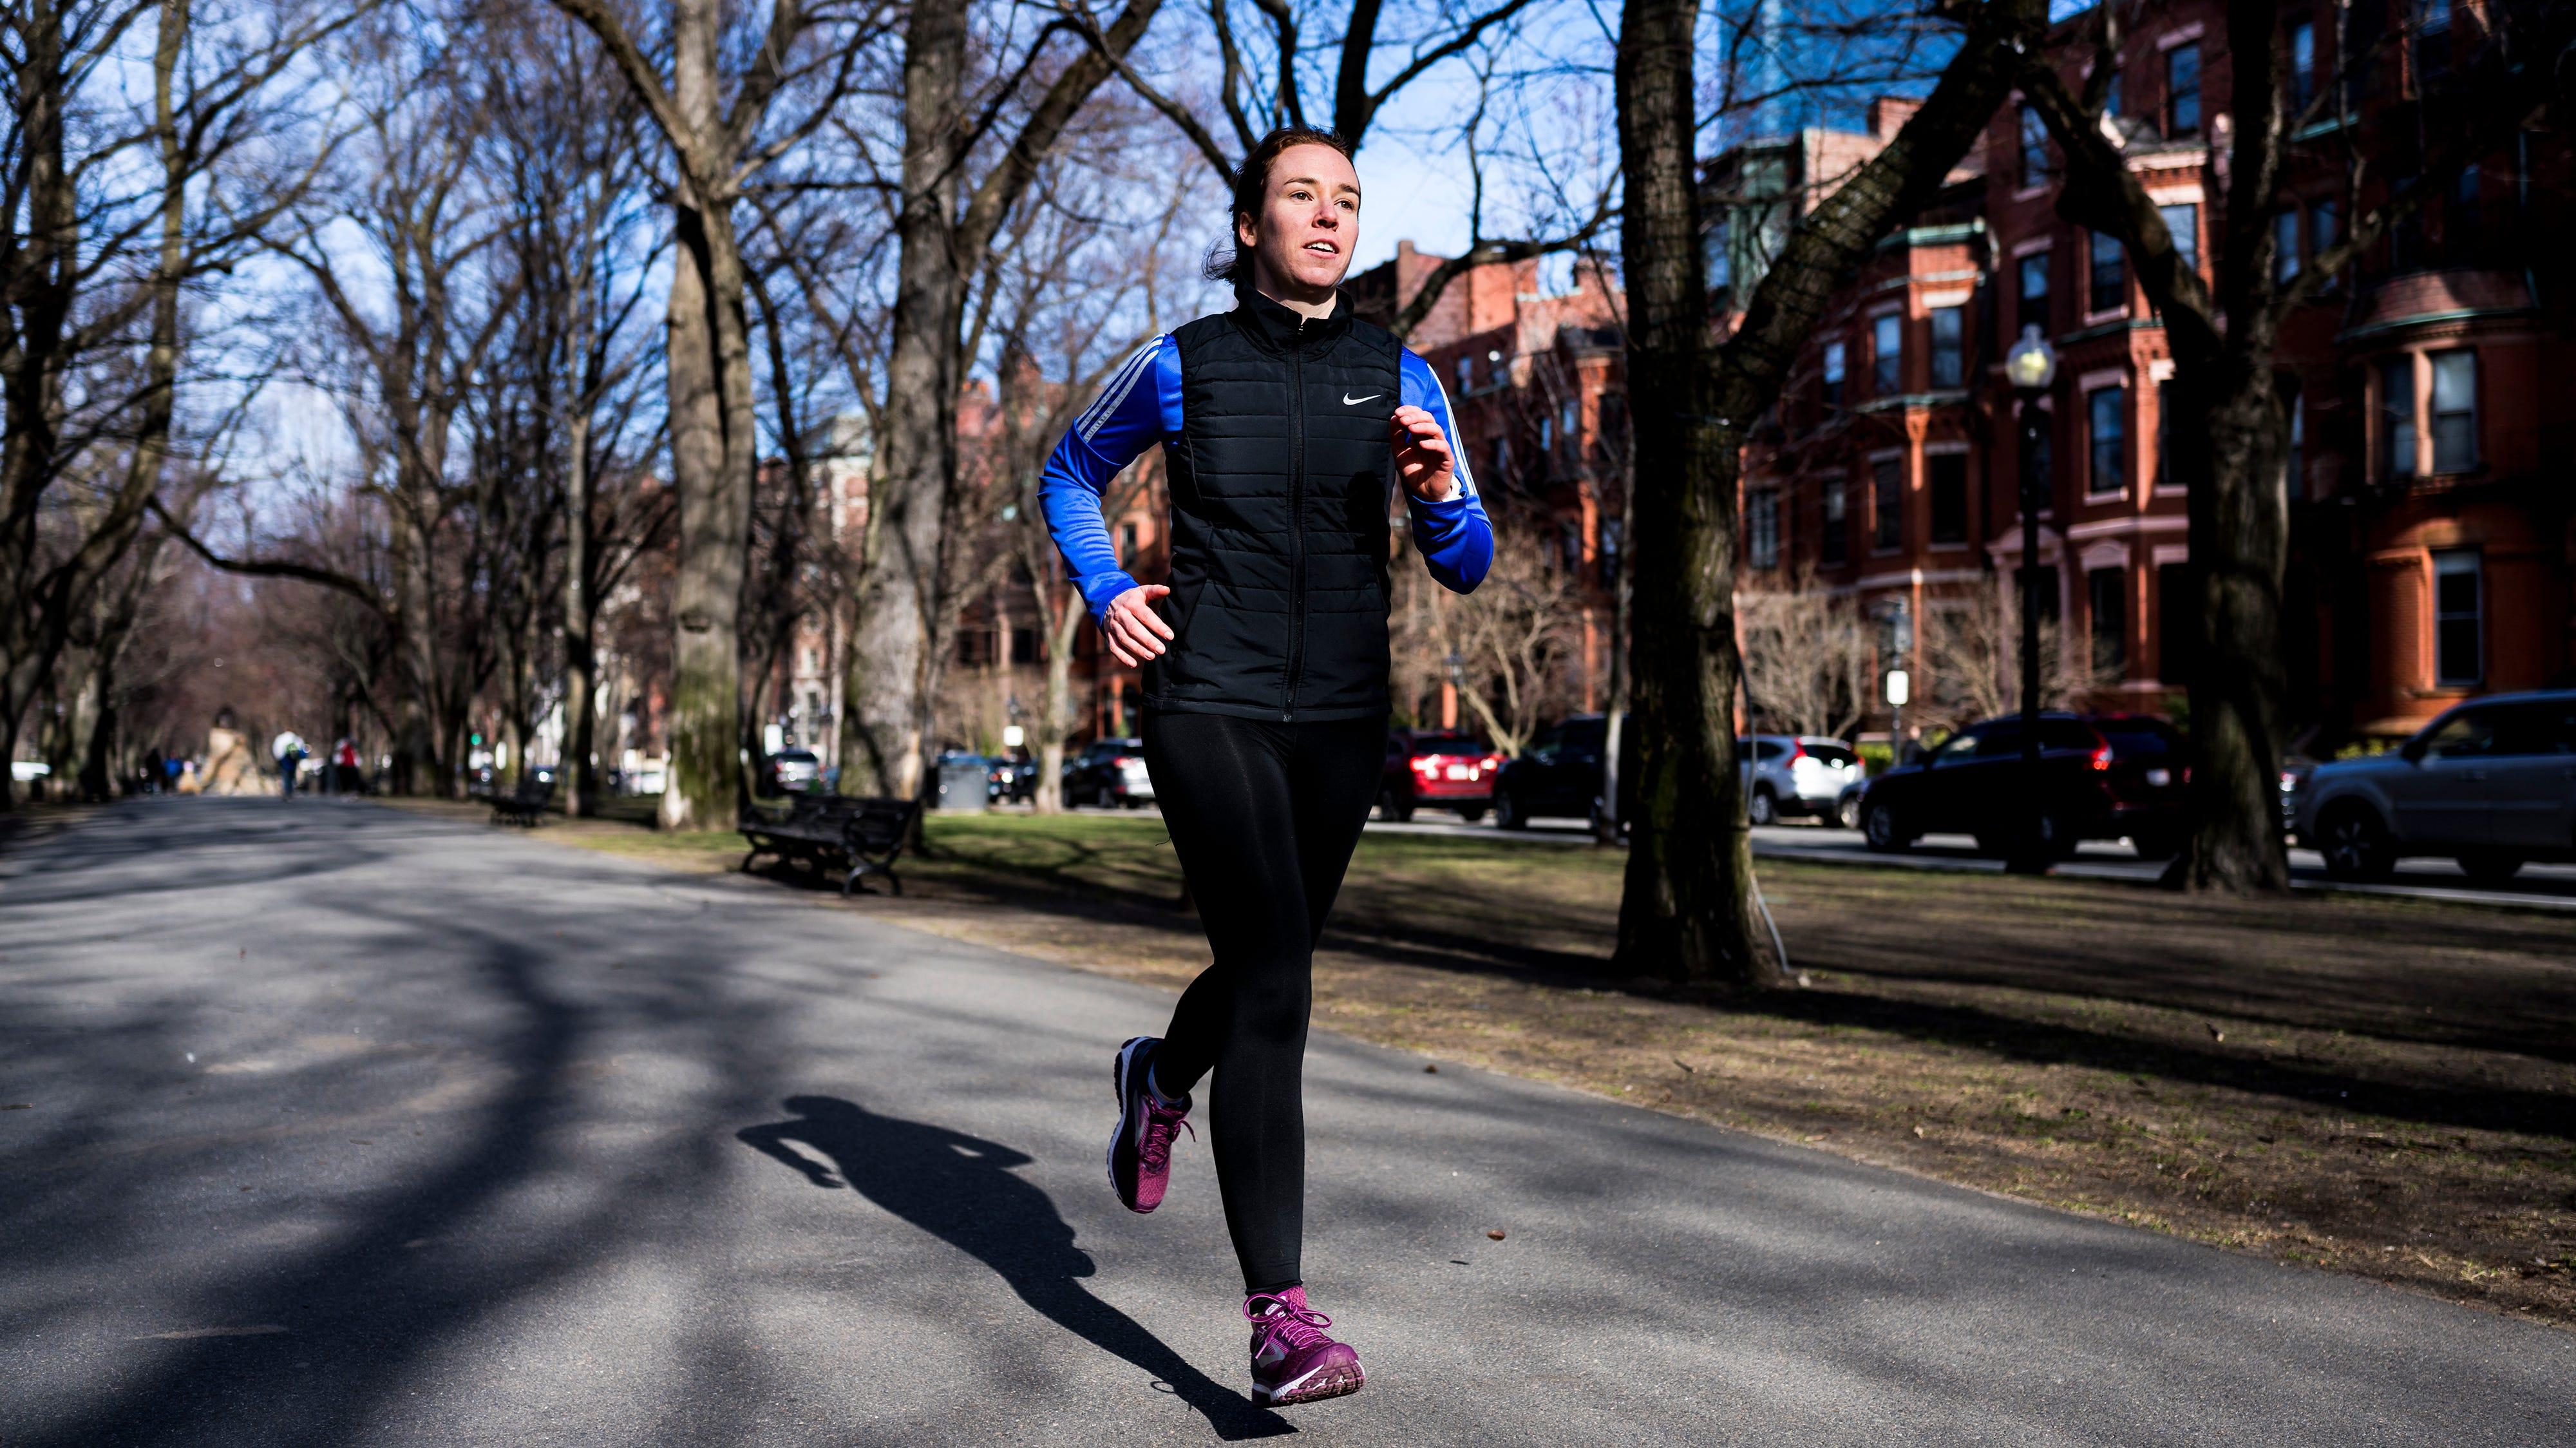 Polk City runner completes rare feat: finishing series of 6 major world marathons